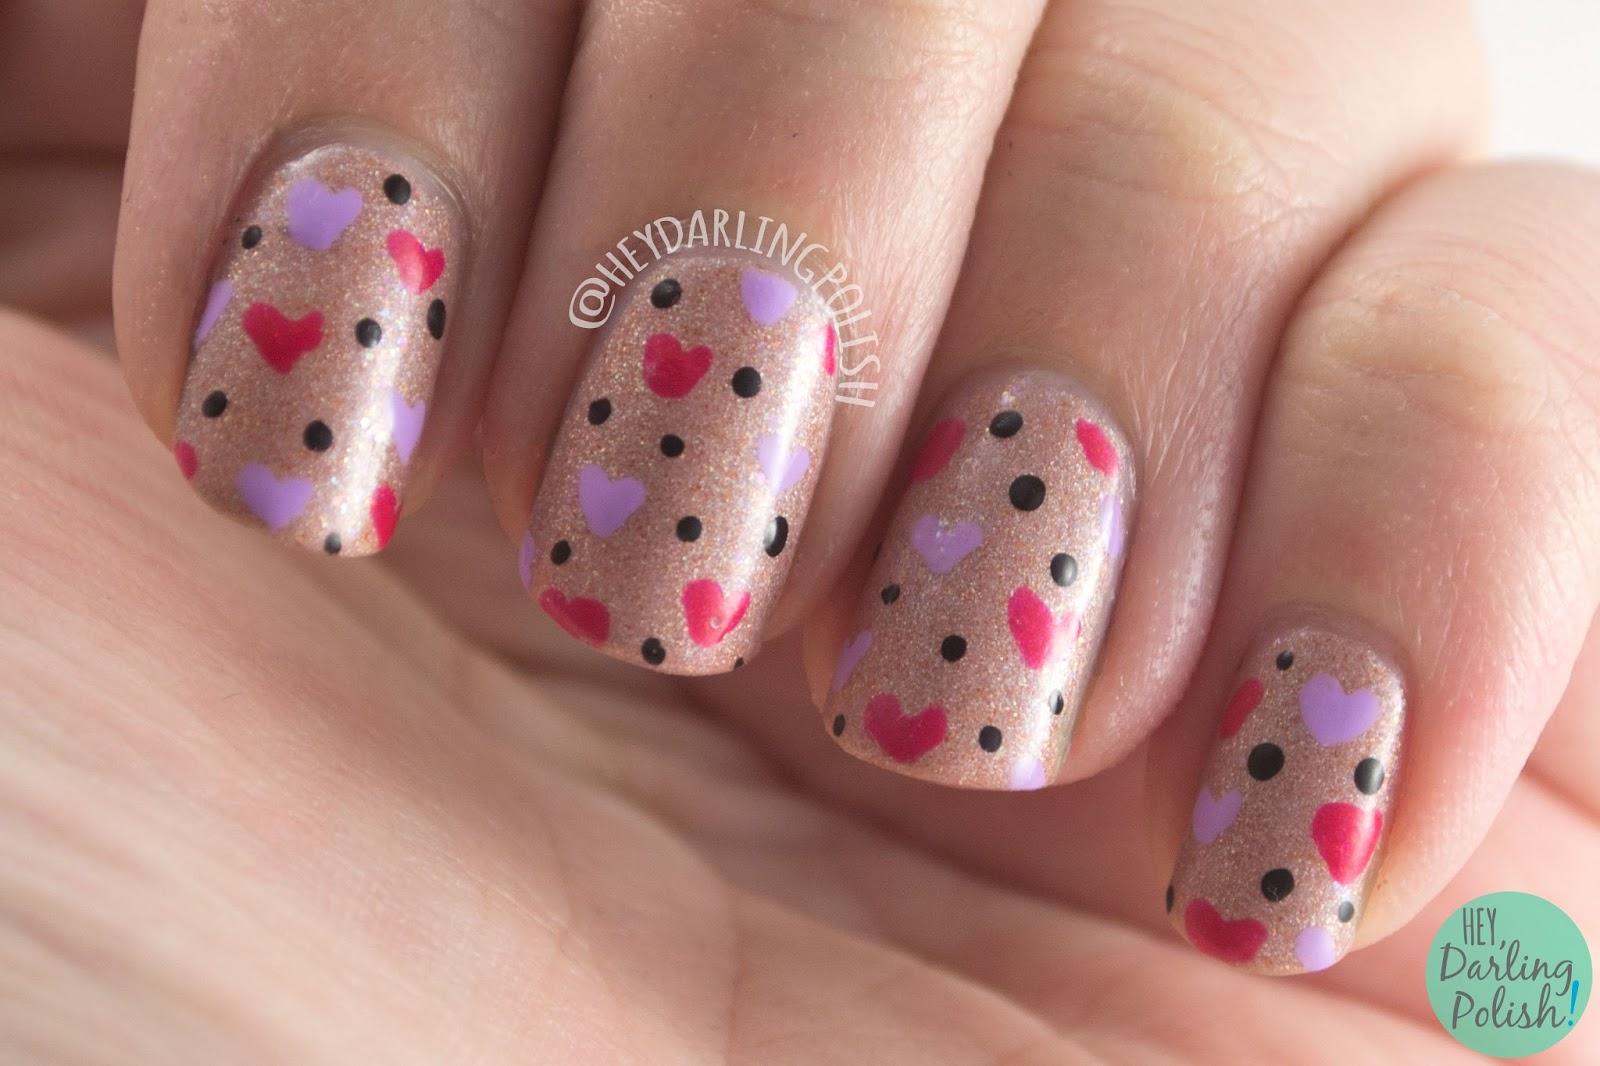 nails, nail art, nail polish, valentine's, hearts, hobby polish bloggers, hey darling polish, indie polish,